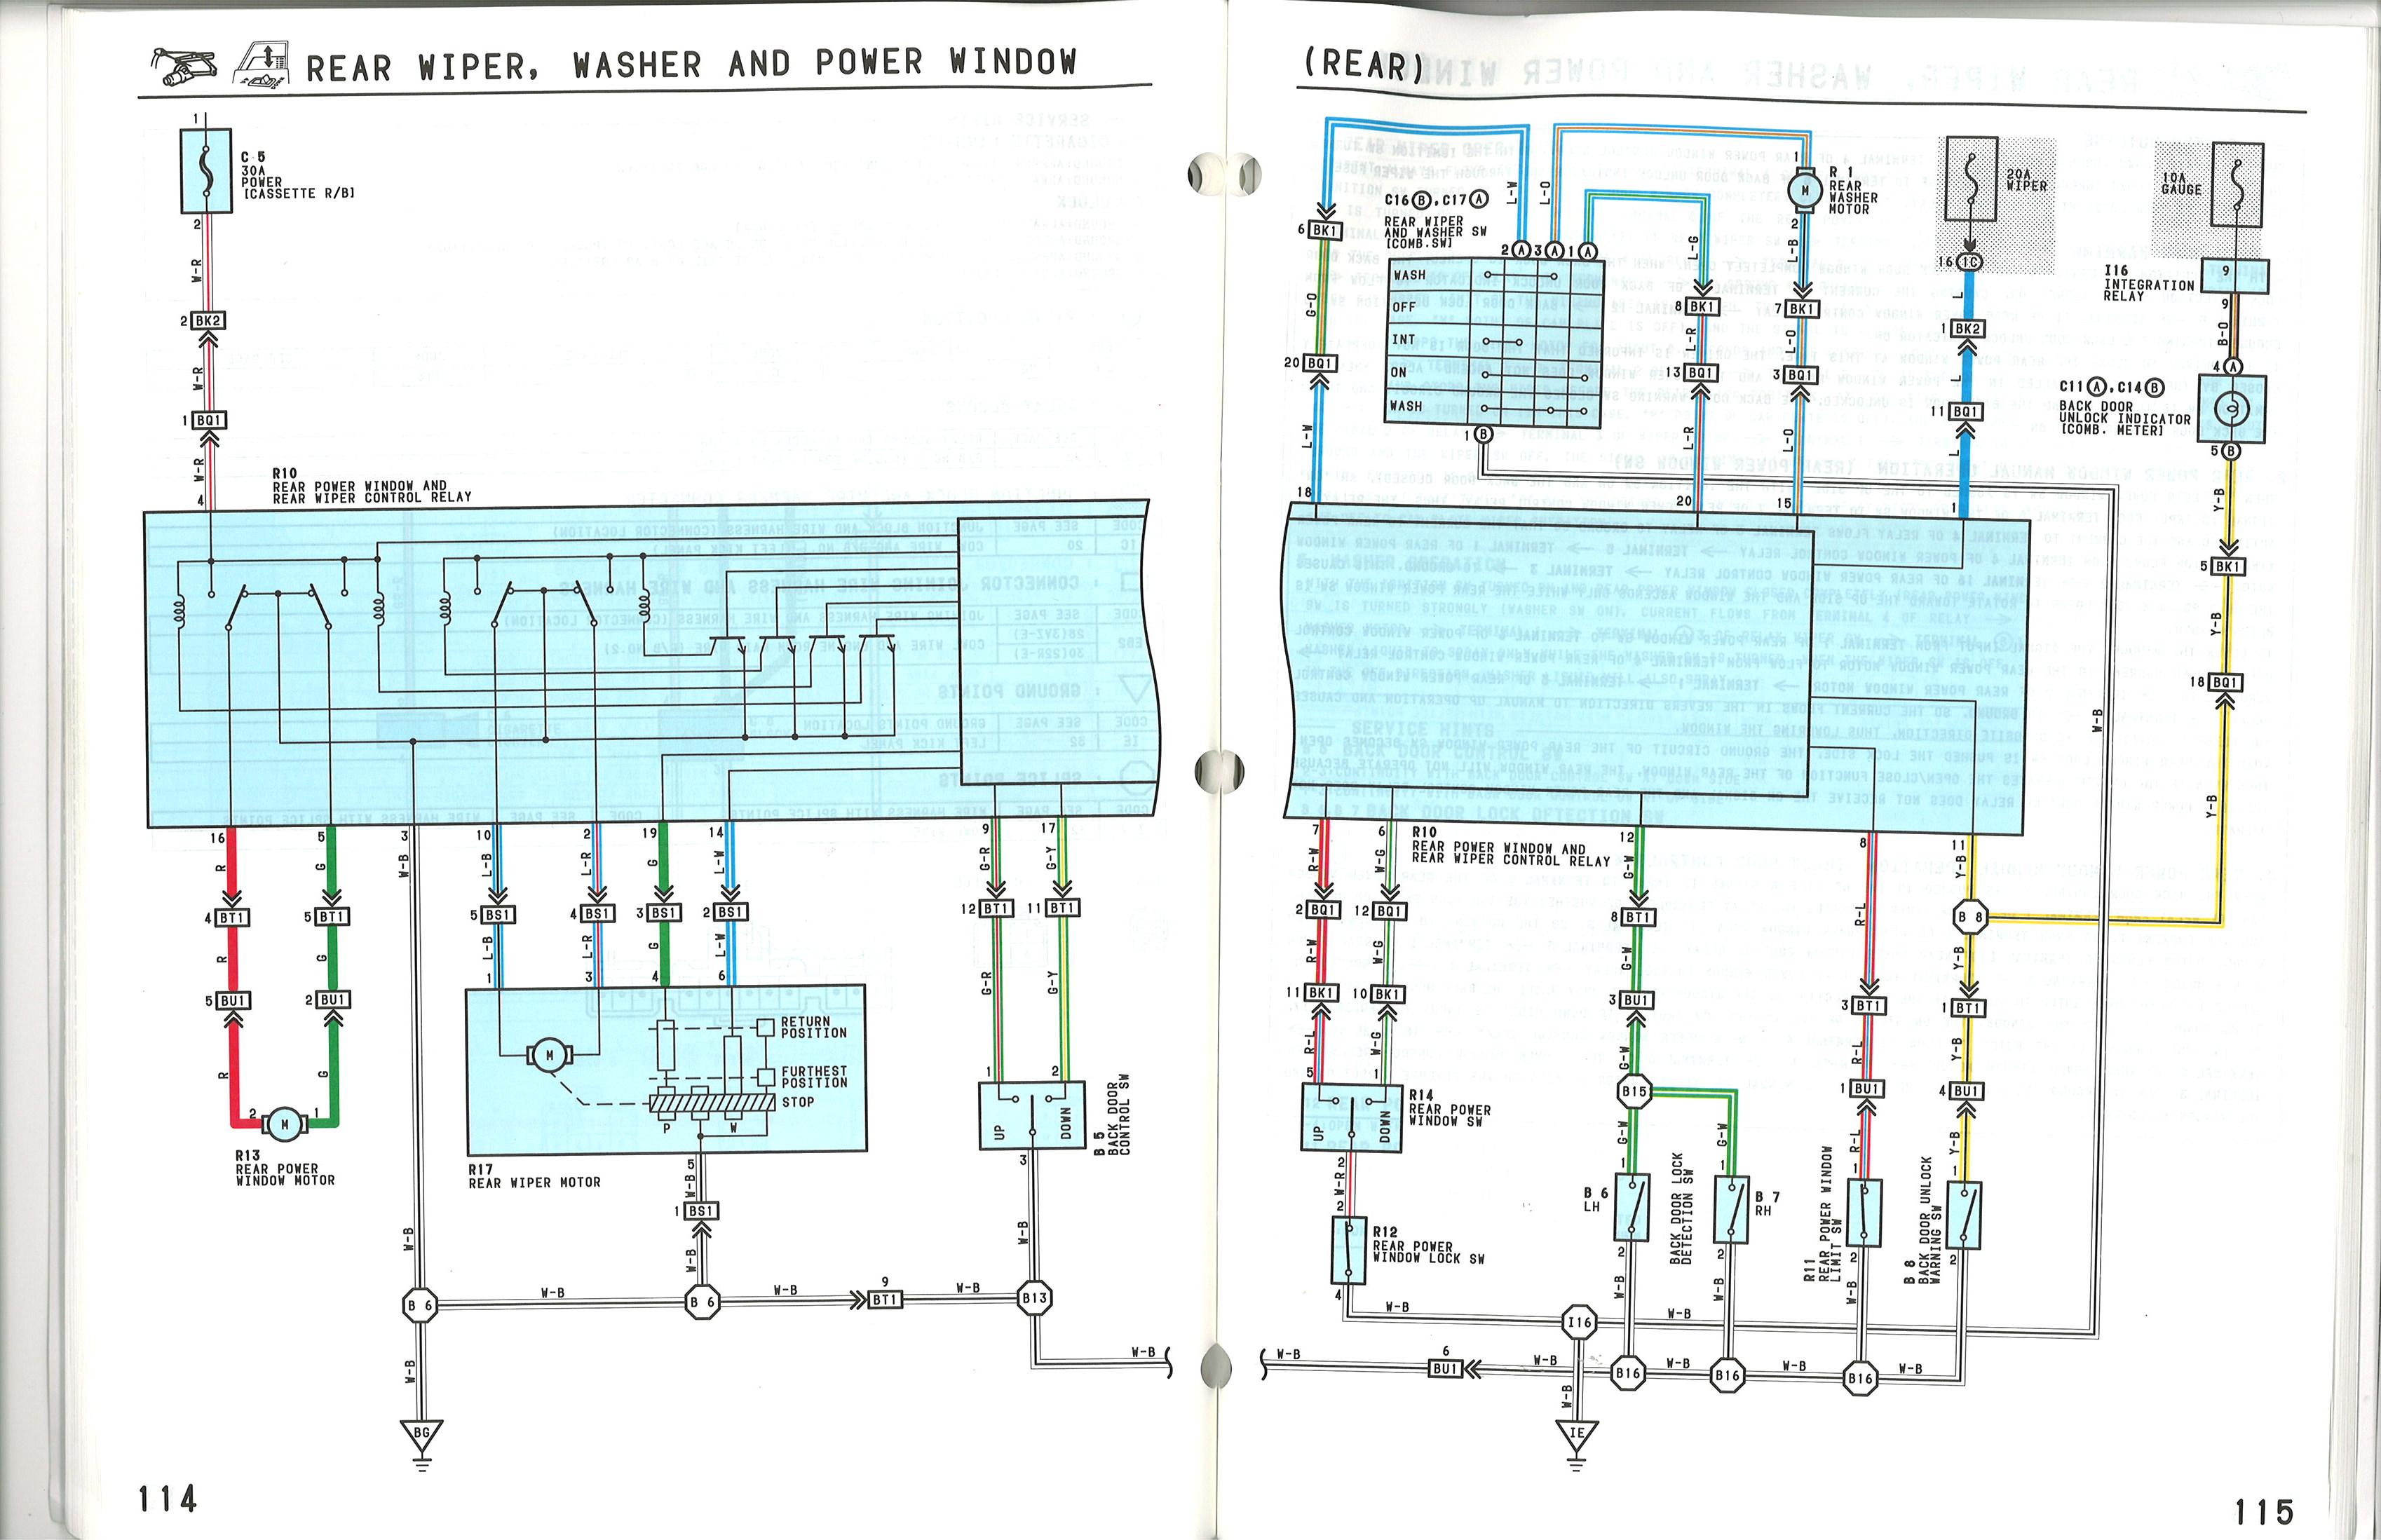 Wiring Diagram Power Windows Corvette Home Design Ideas - Wiring diagram nissan b13